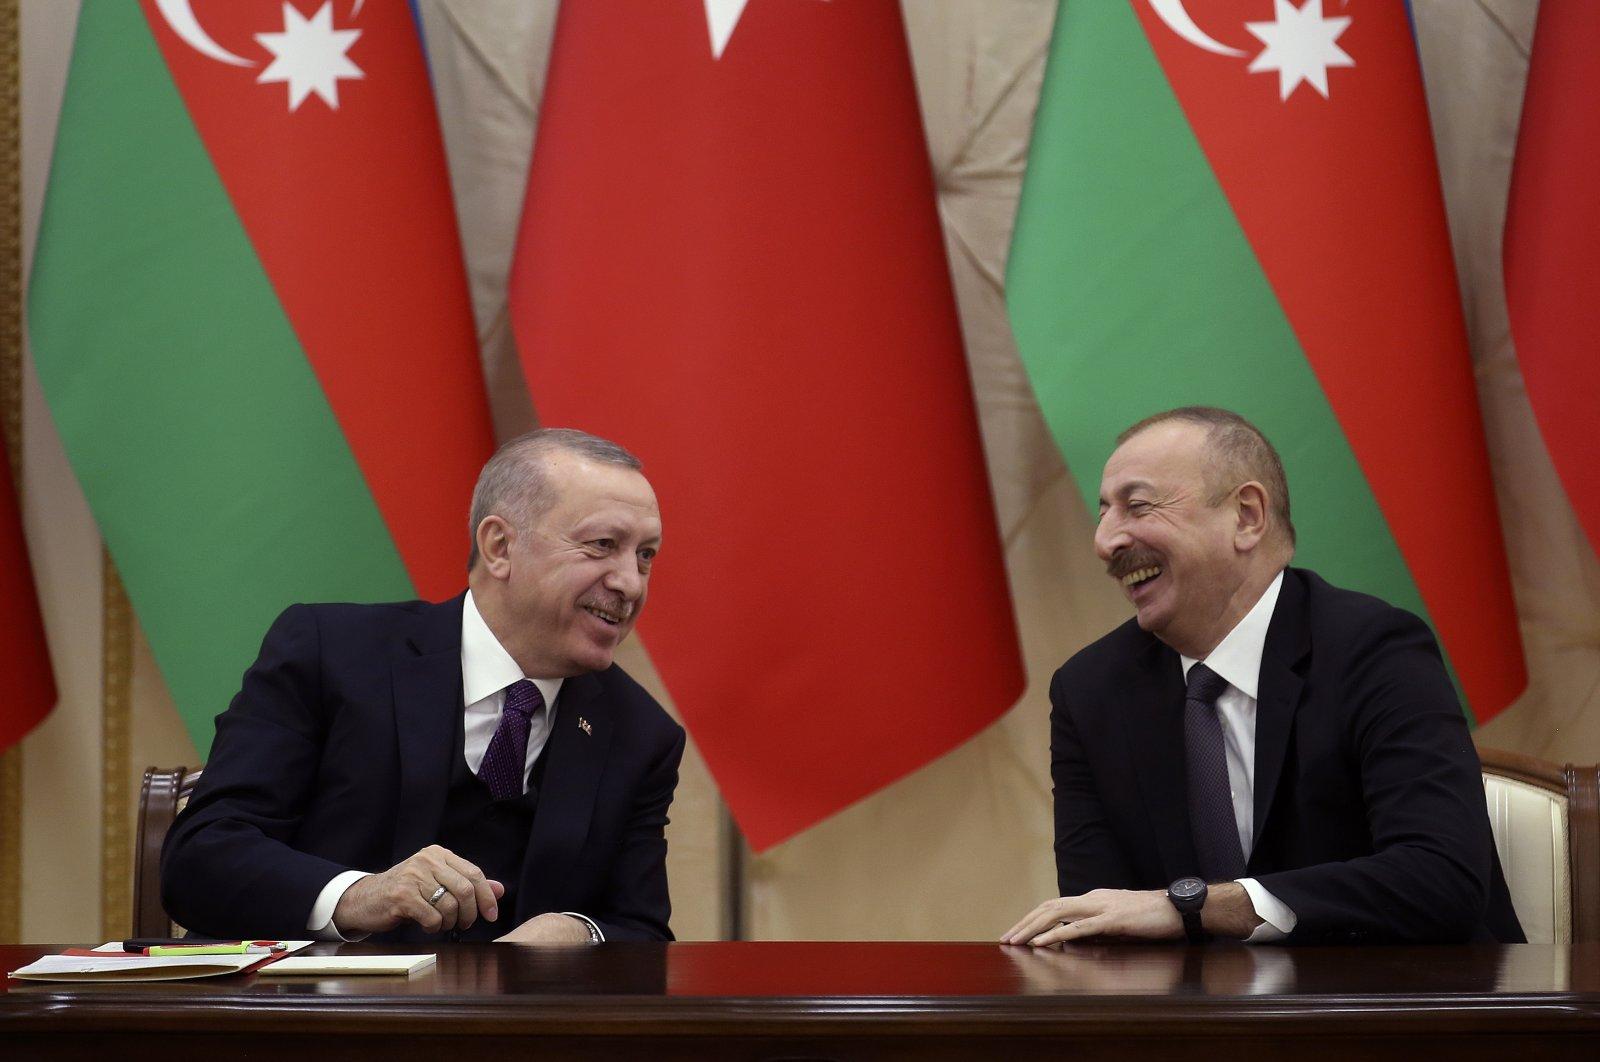 President Recep Tayyip Erdoğan (L) and Azerbaijani President Ilham Aliyev speak during a press conference, in Baku, Azerbaijan, Feb. 25, 2020. (AP Photo)